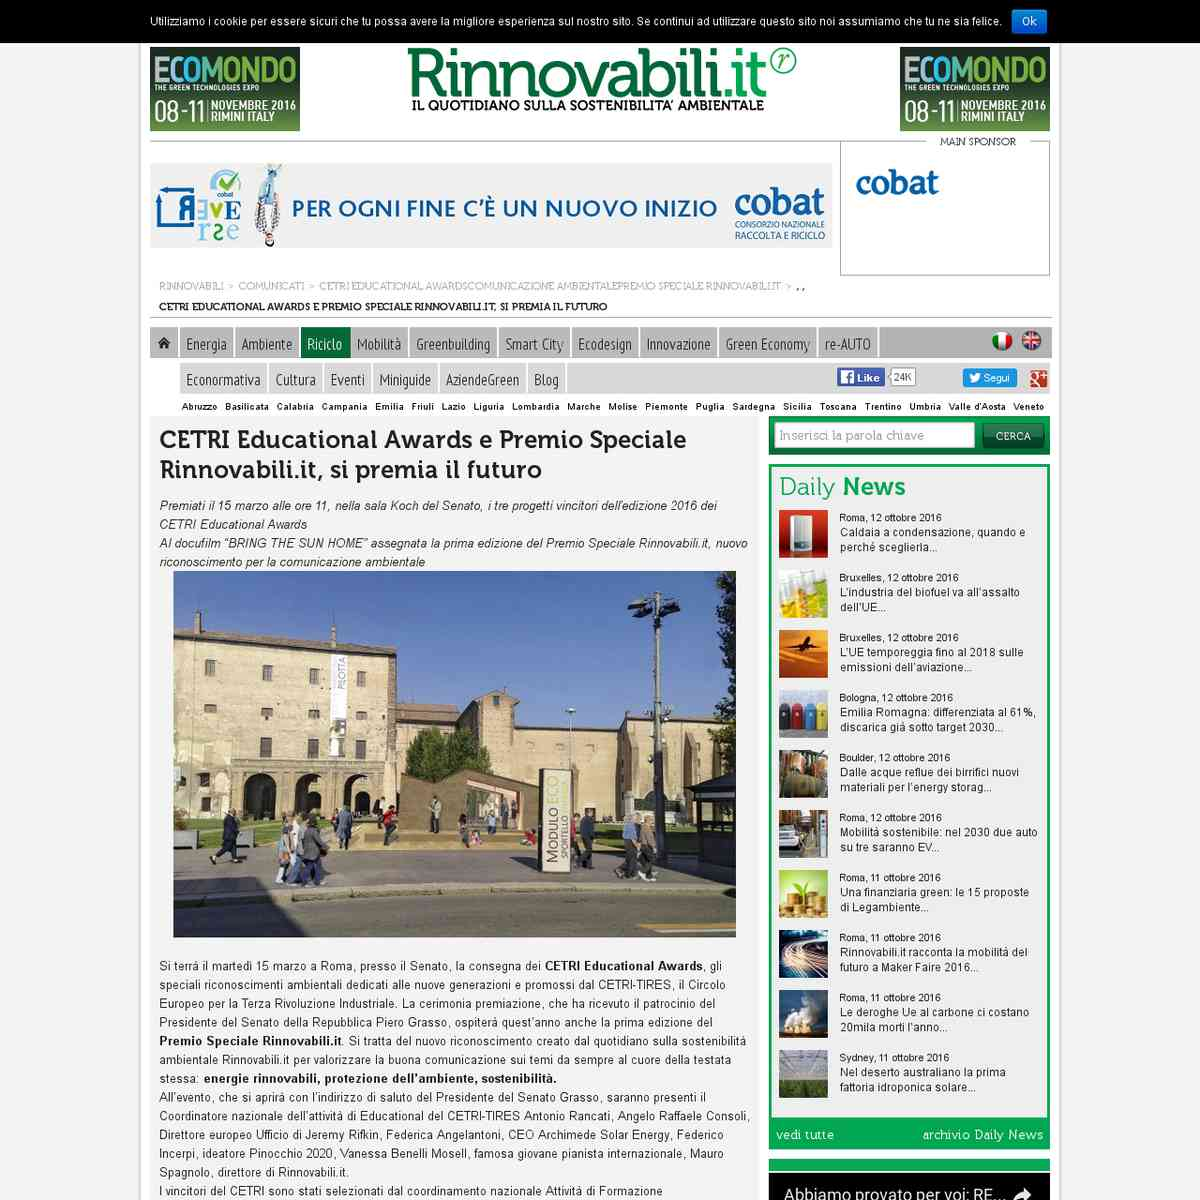 CETRI Educational Awards e Premio Speciale Rinnovabili.it